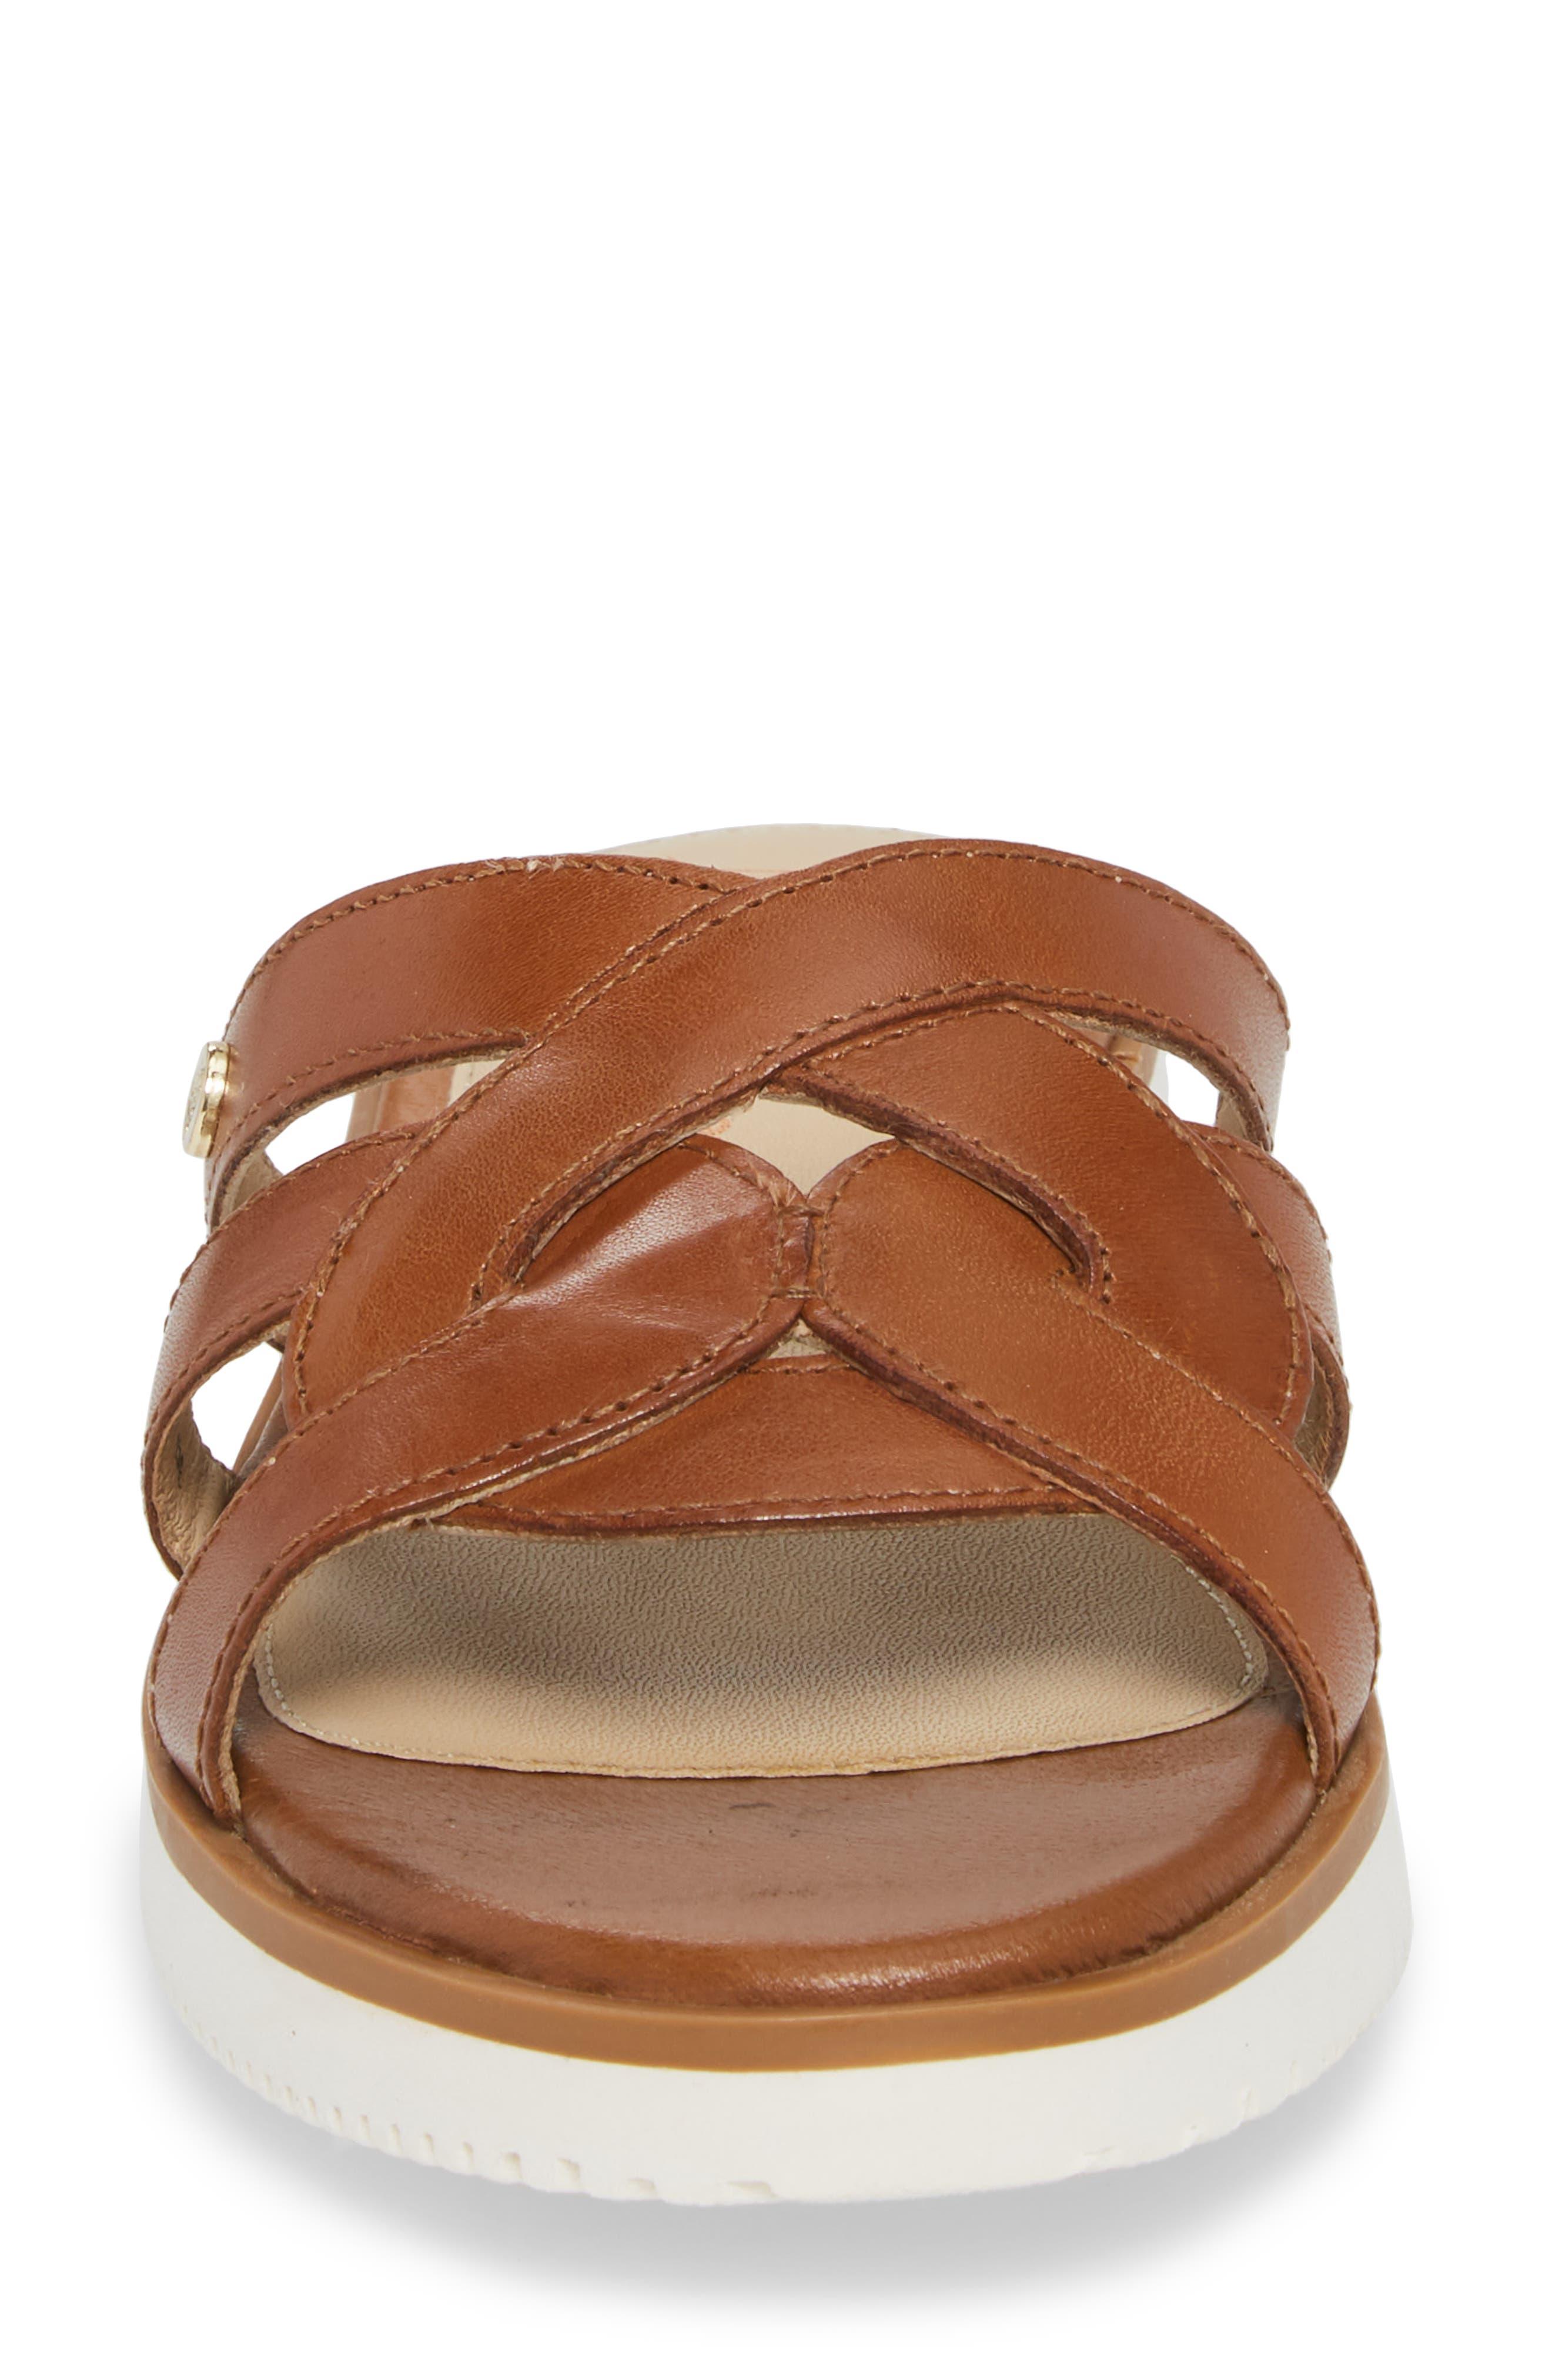 Braid Slide Sandal,                             Alternate thumbnail 4, color,                             Tan Leather